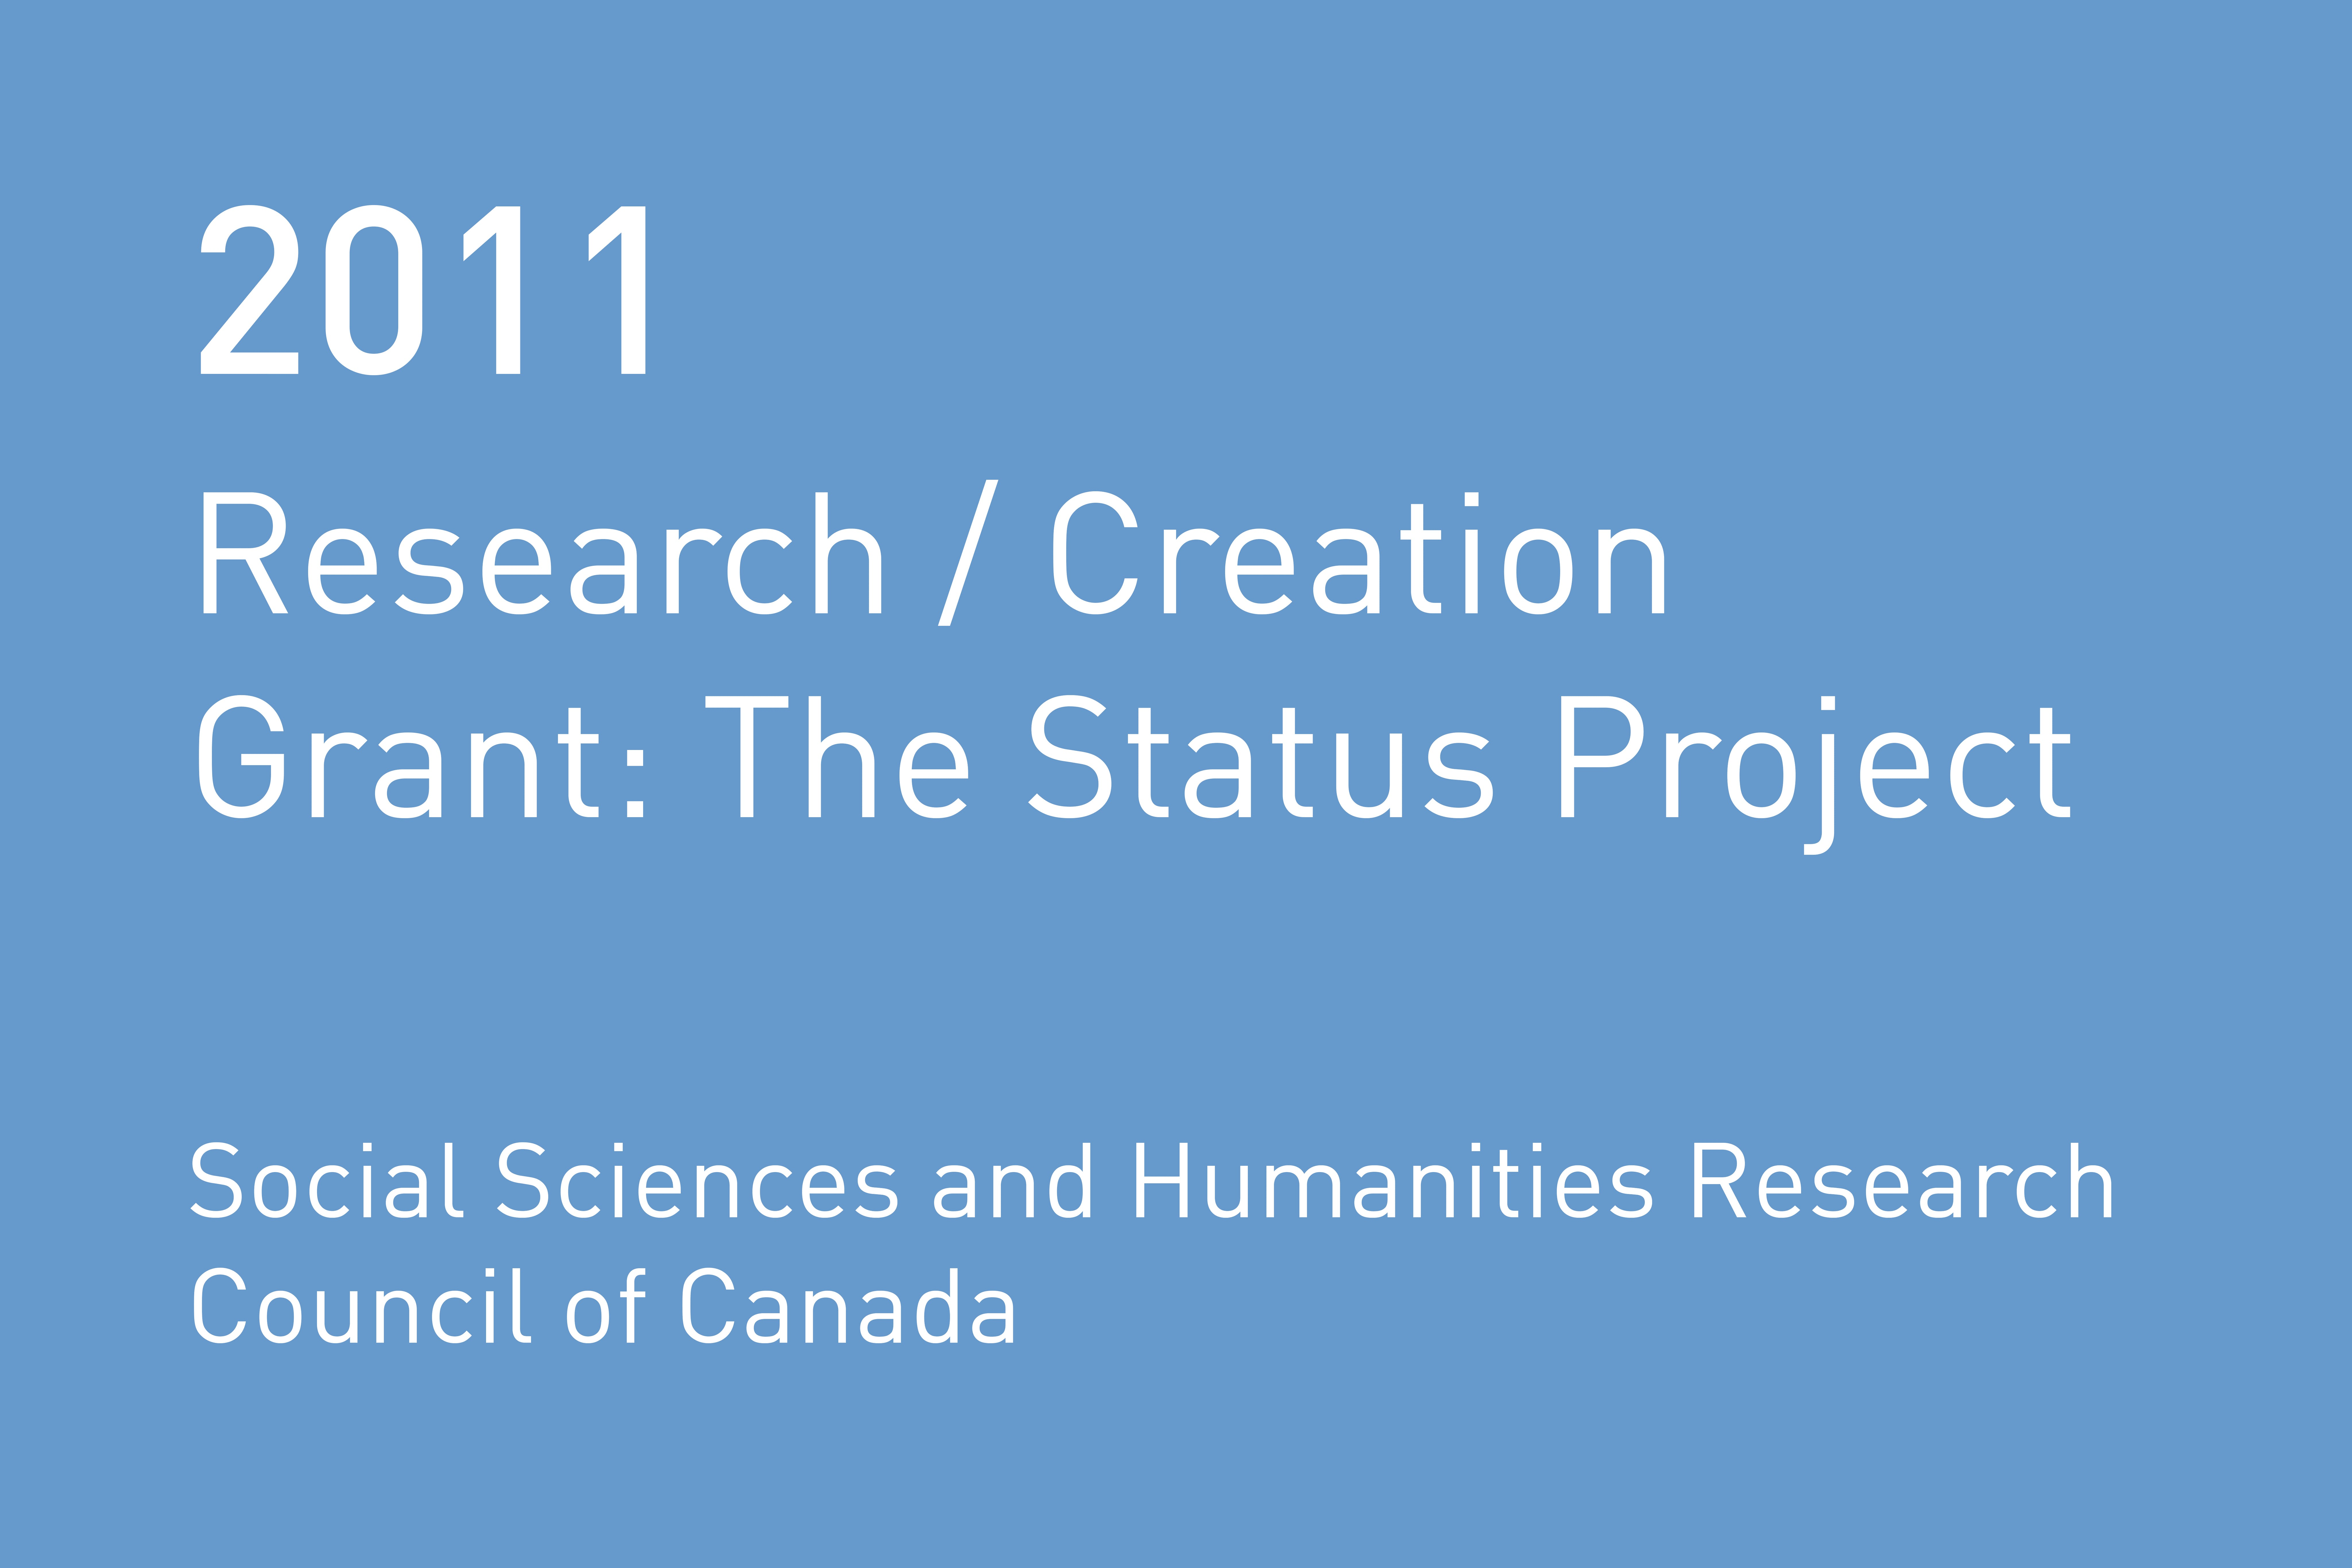 Rvtr 2011 research creation